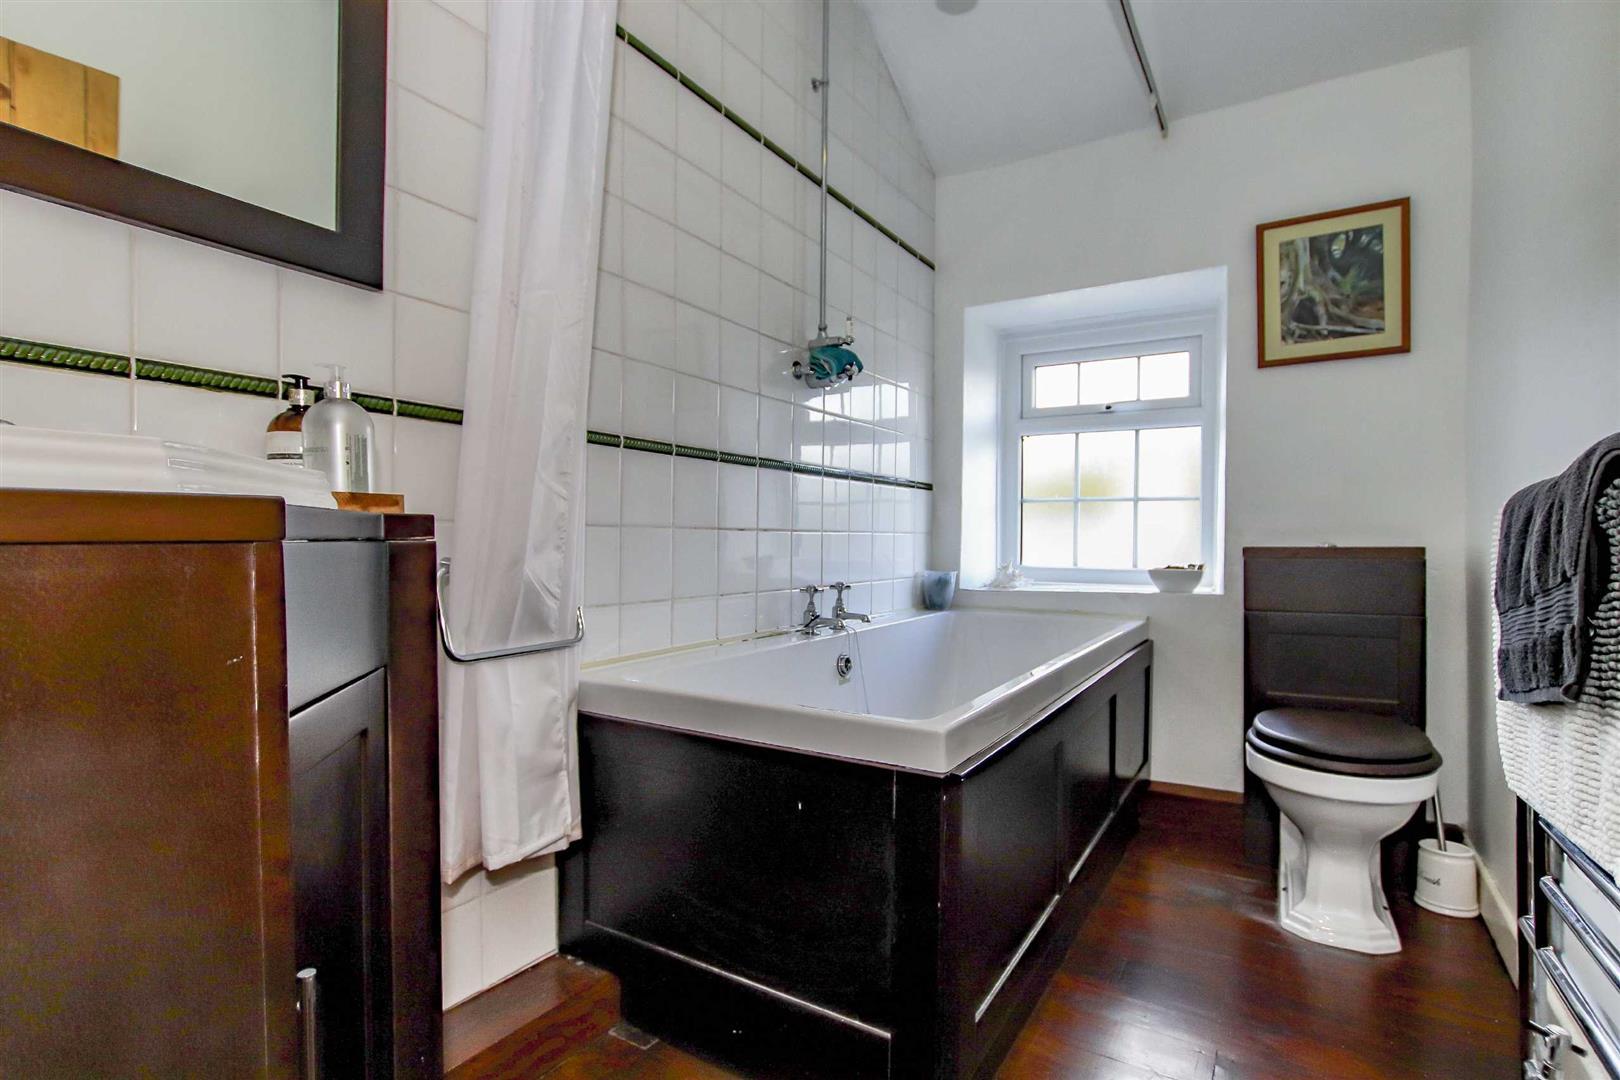 4 Bedroom Detached House For Sale - p033686_18.jpg